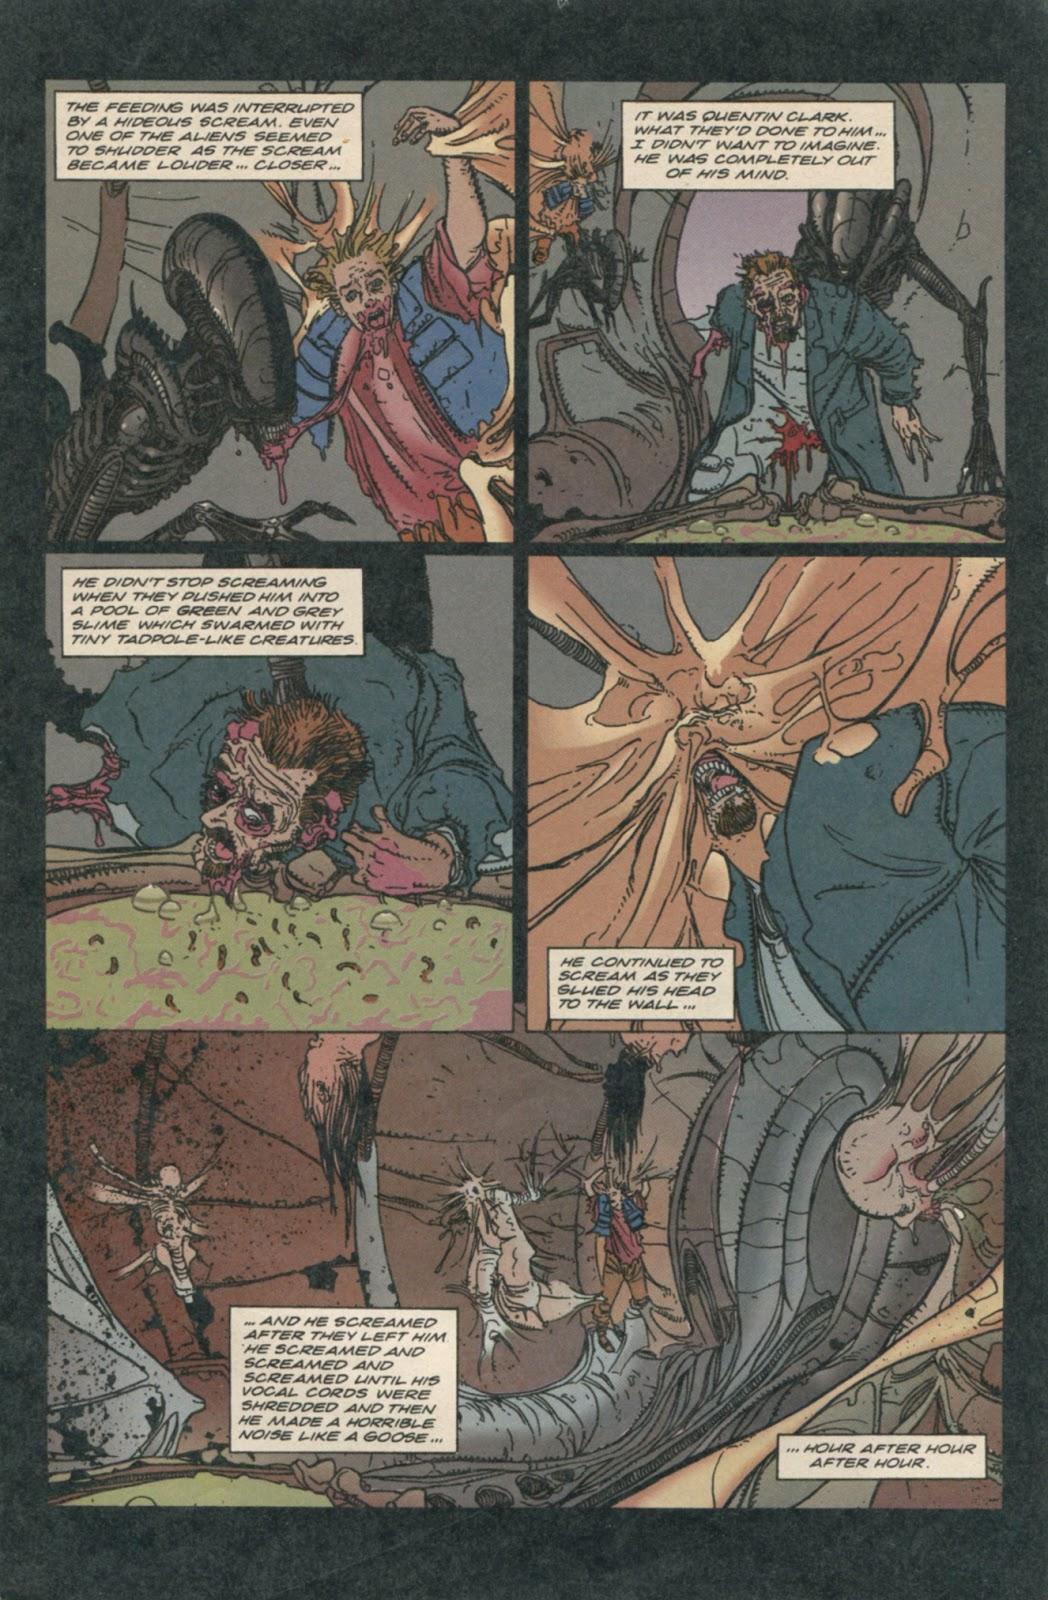 Impreg Comics Amazing emergency surgery (aliens- defiance #7) : comicbooks